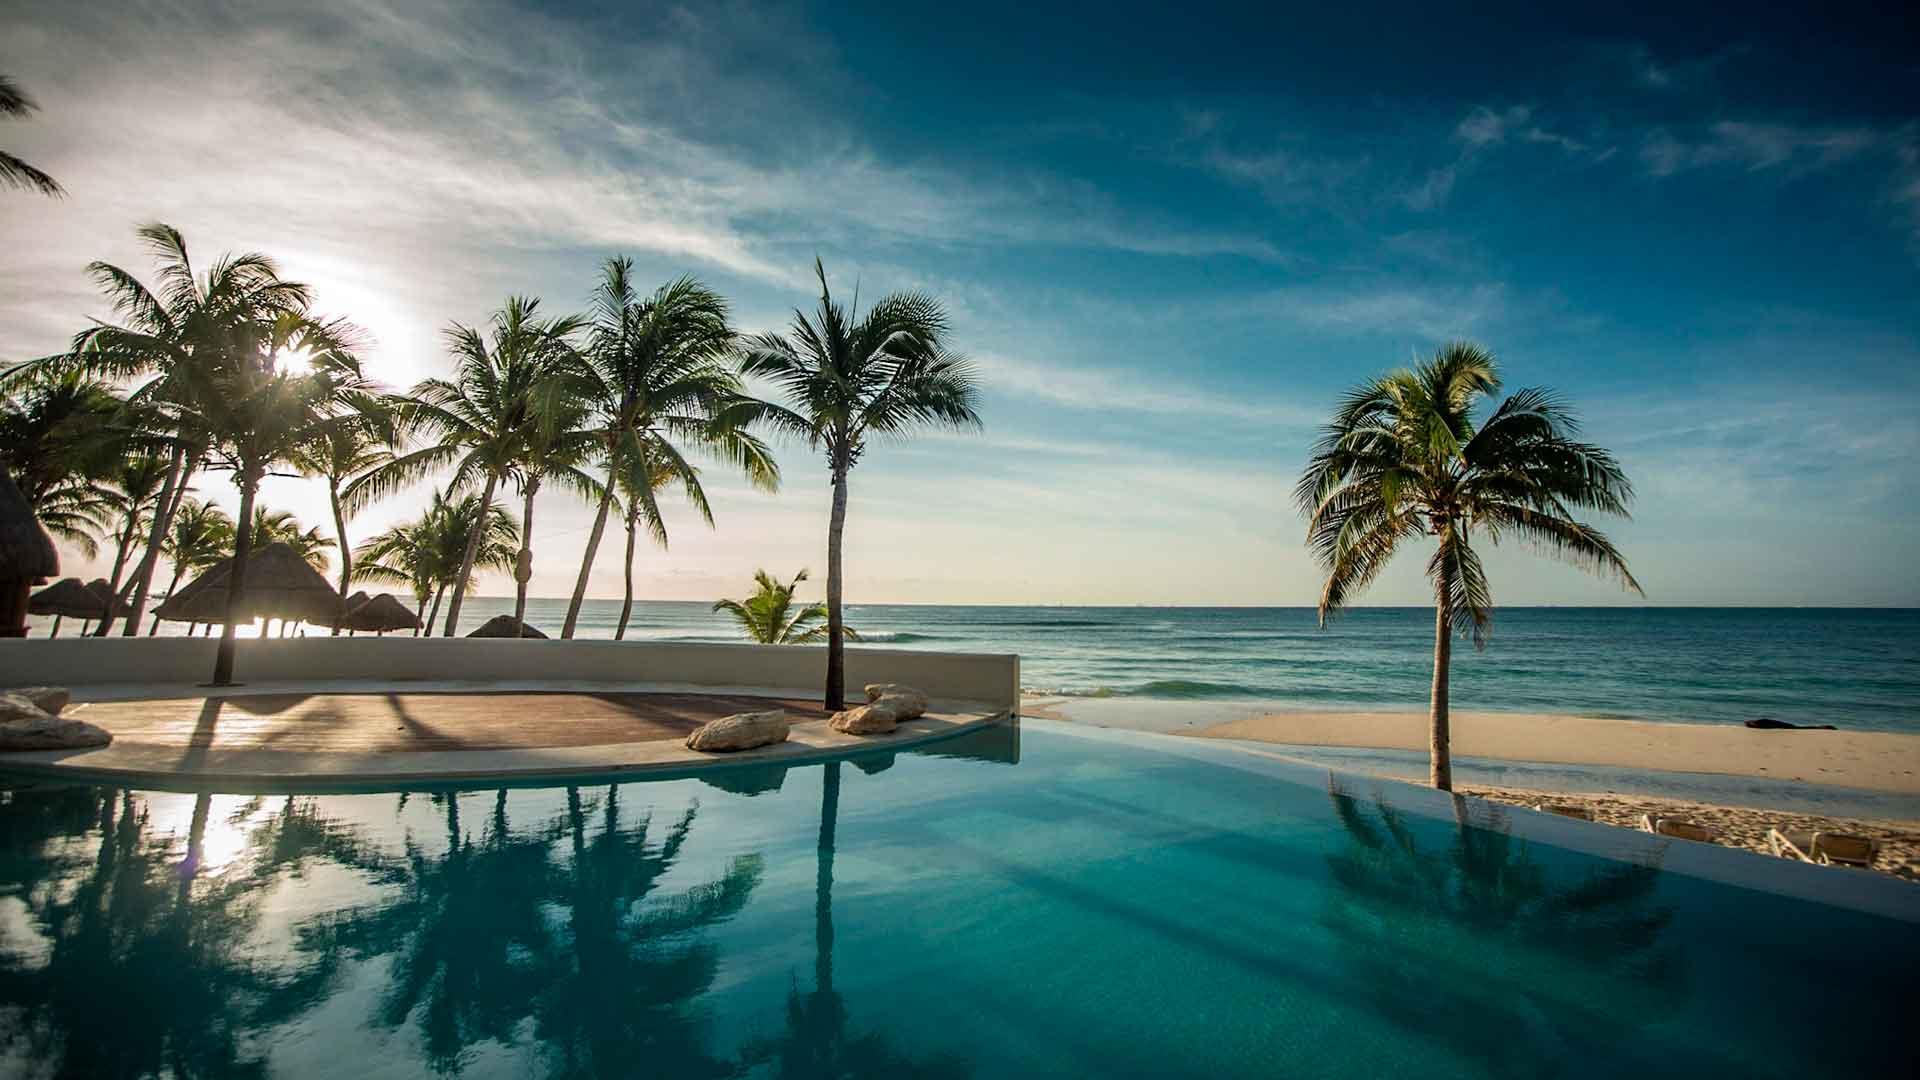 Mahekal Beach Resort, relajante paraíso entre olas